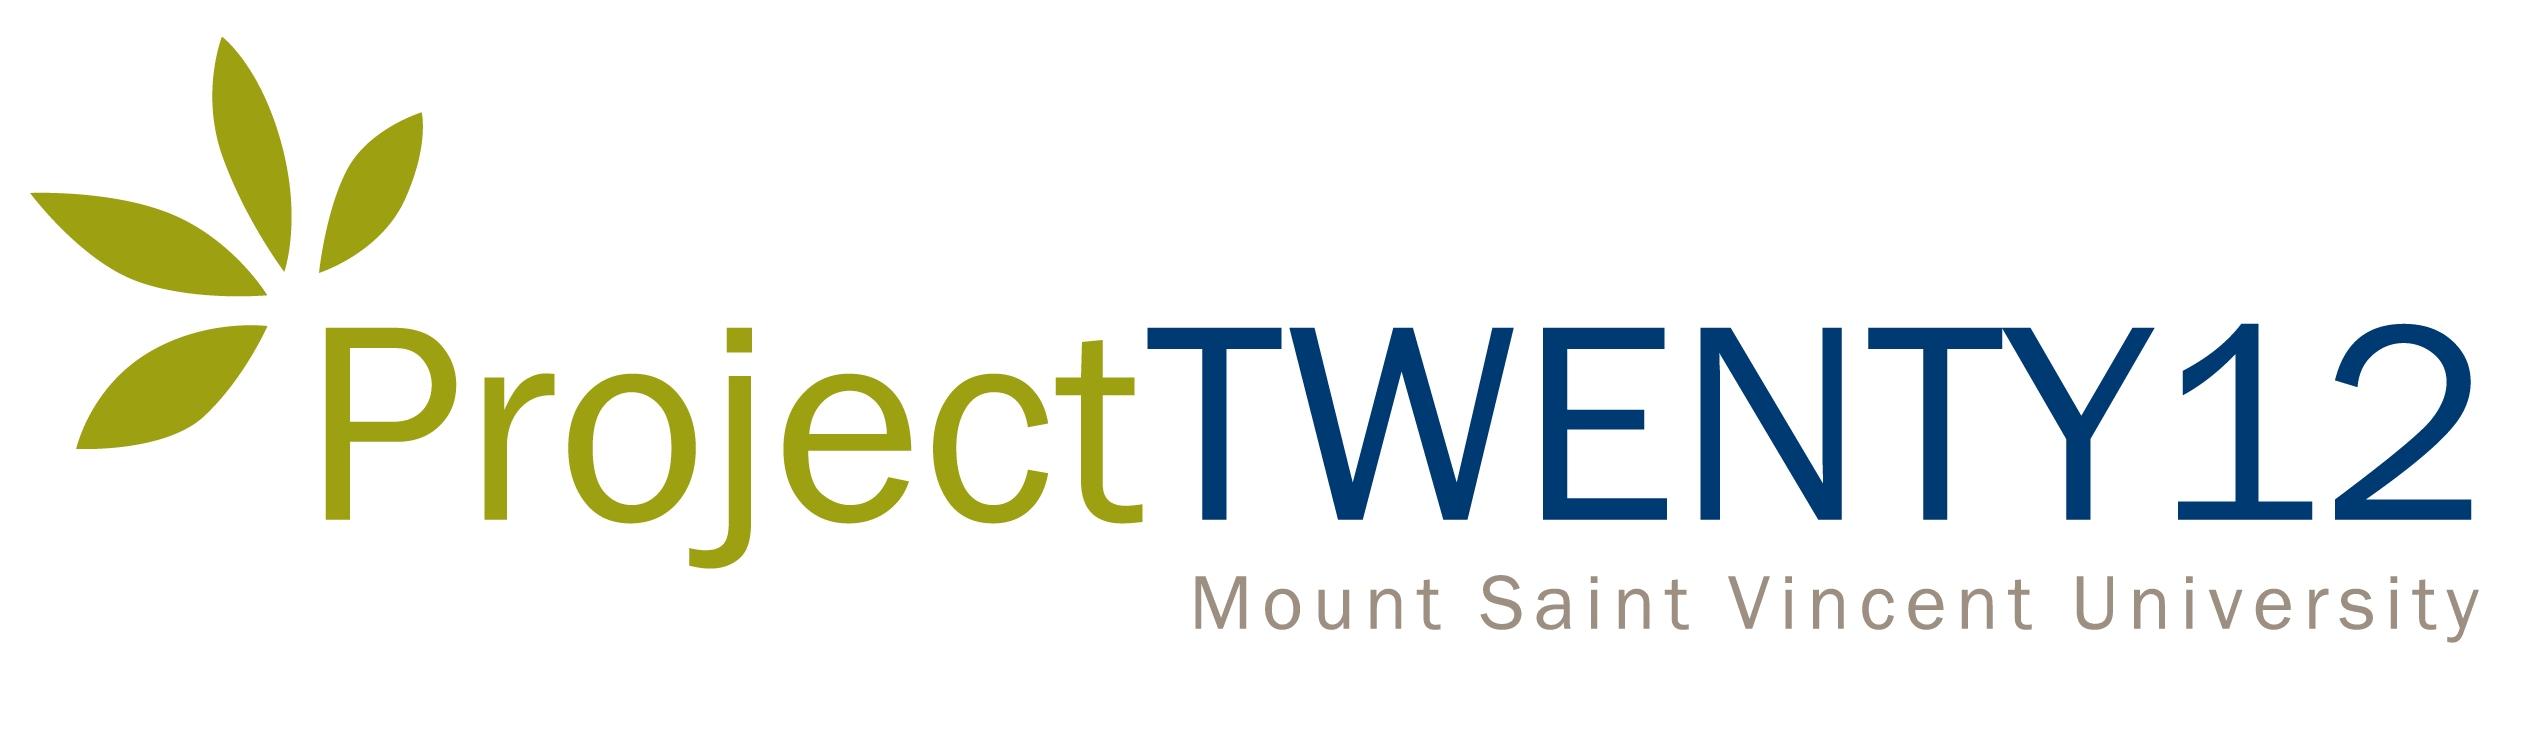 Project TWENTY12 Logo (small)